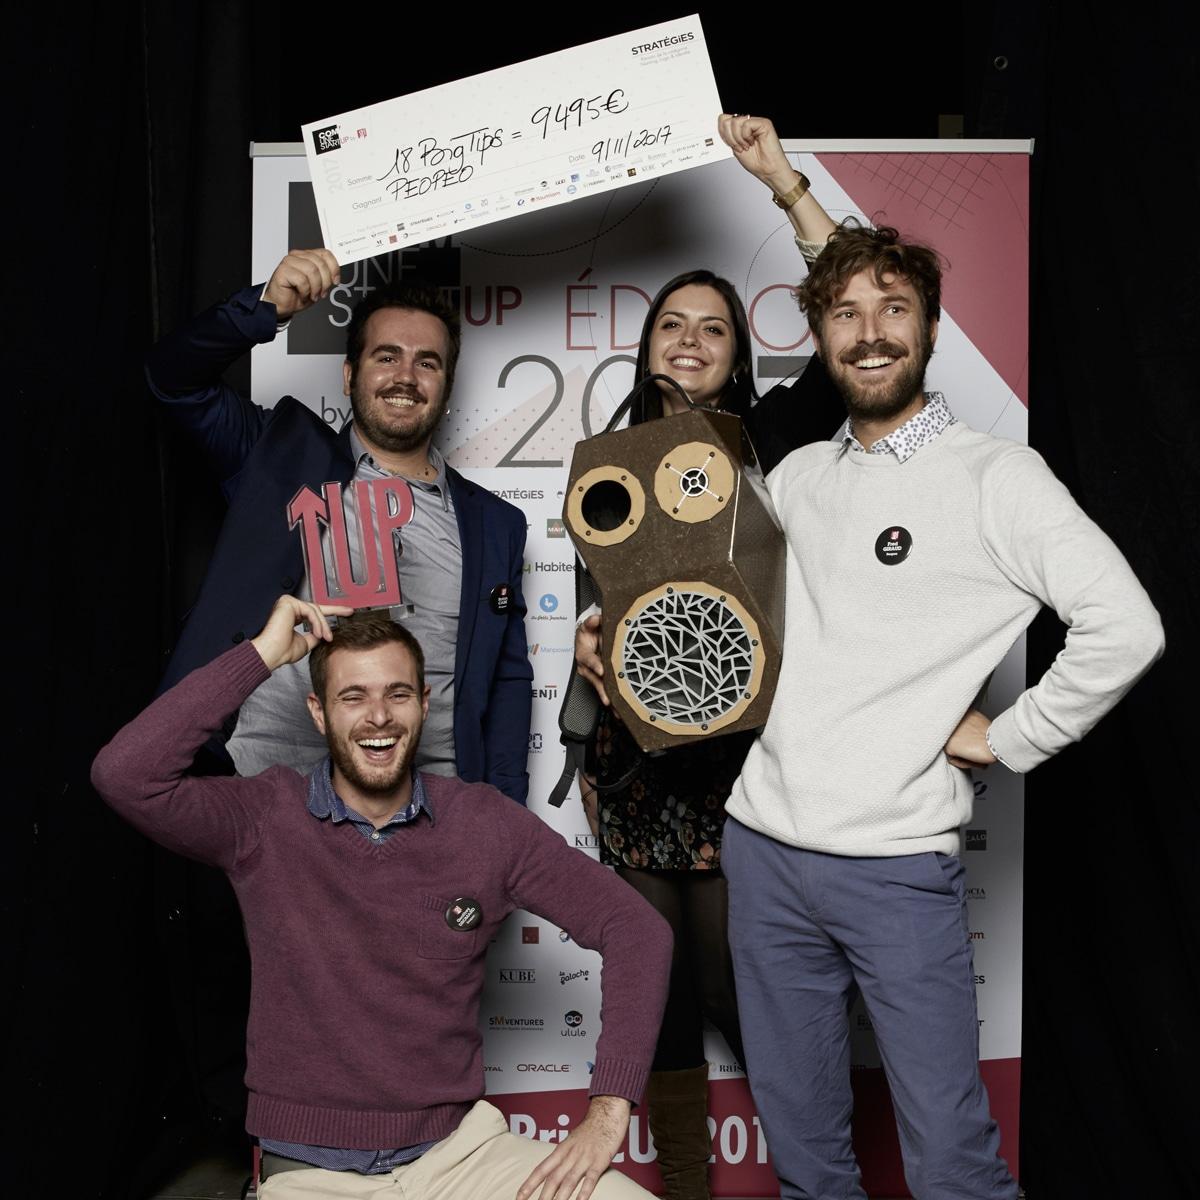 gagnant-big-adresse-merci-peopeo-equipe